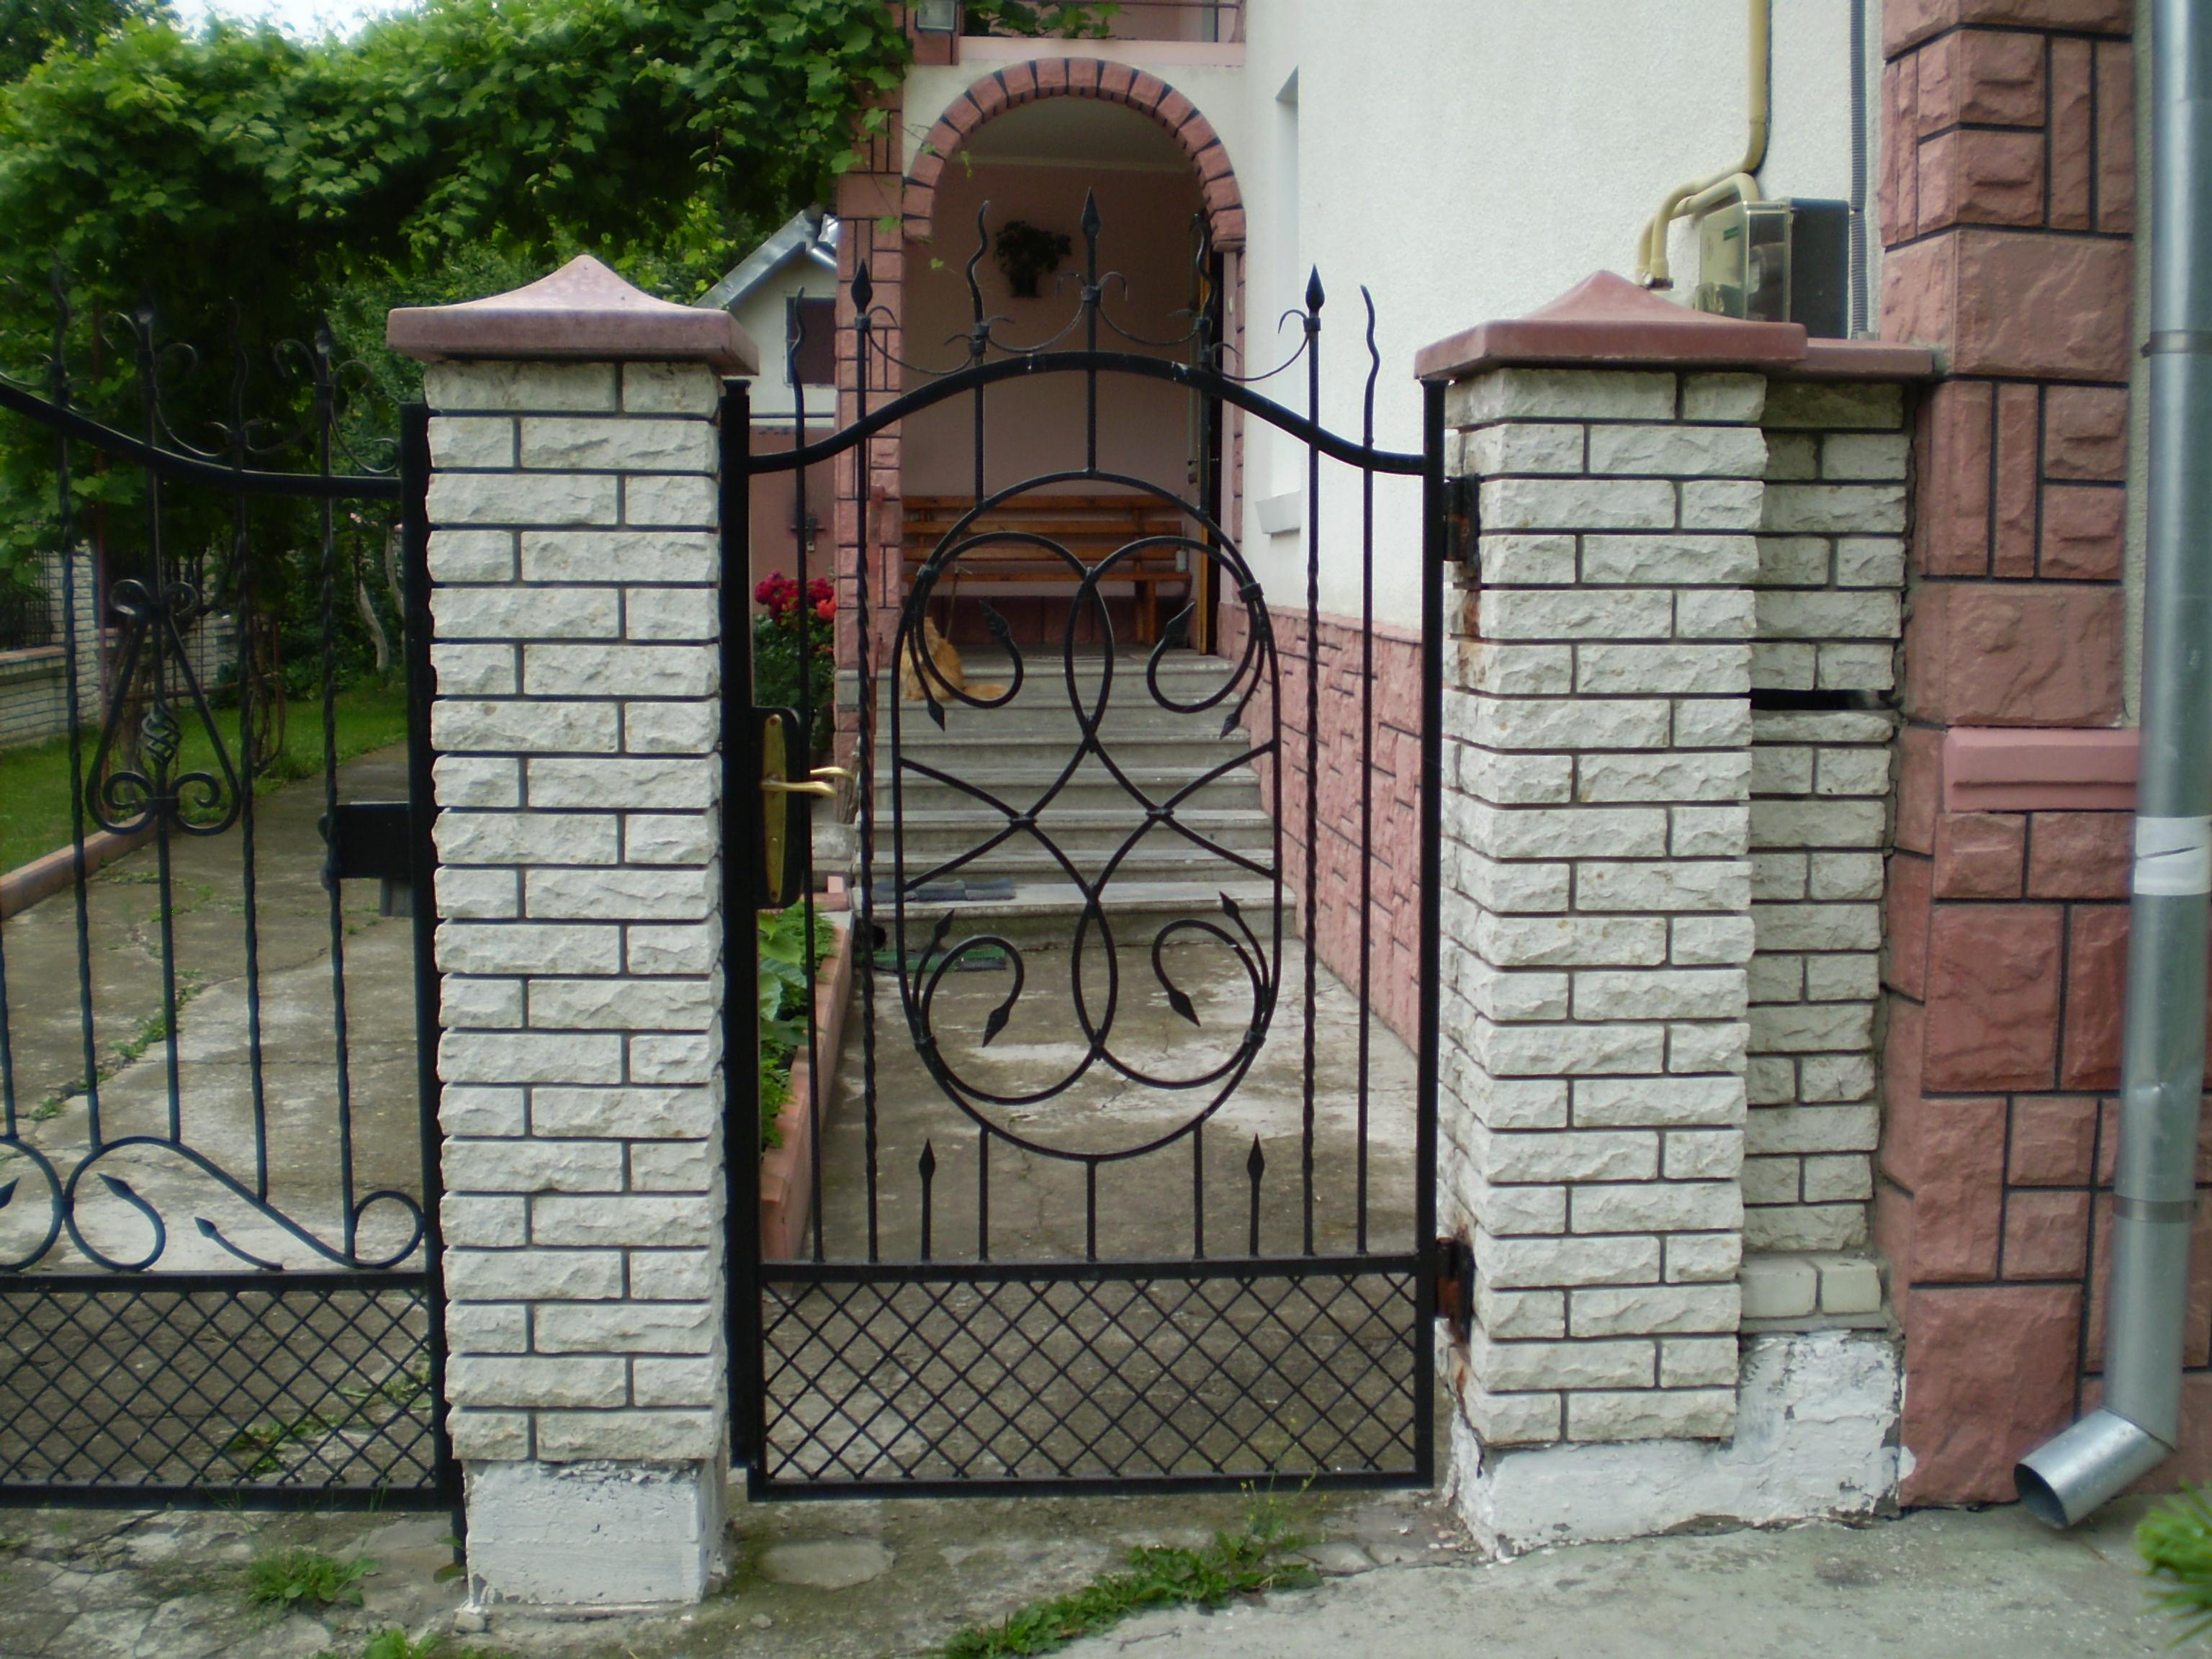 kalitki_kovanye_lvov